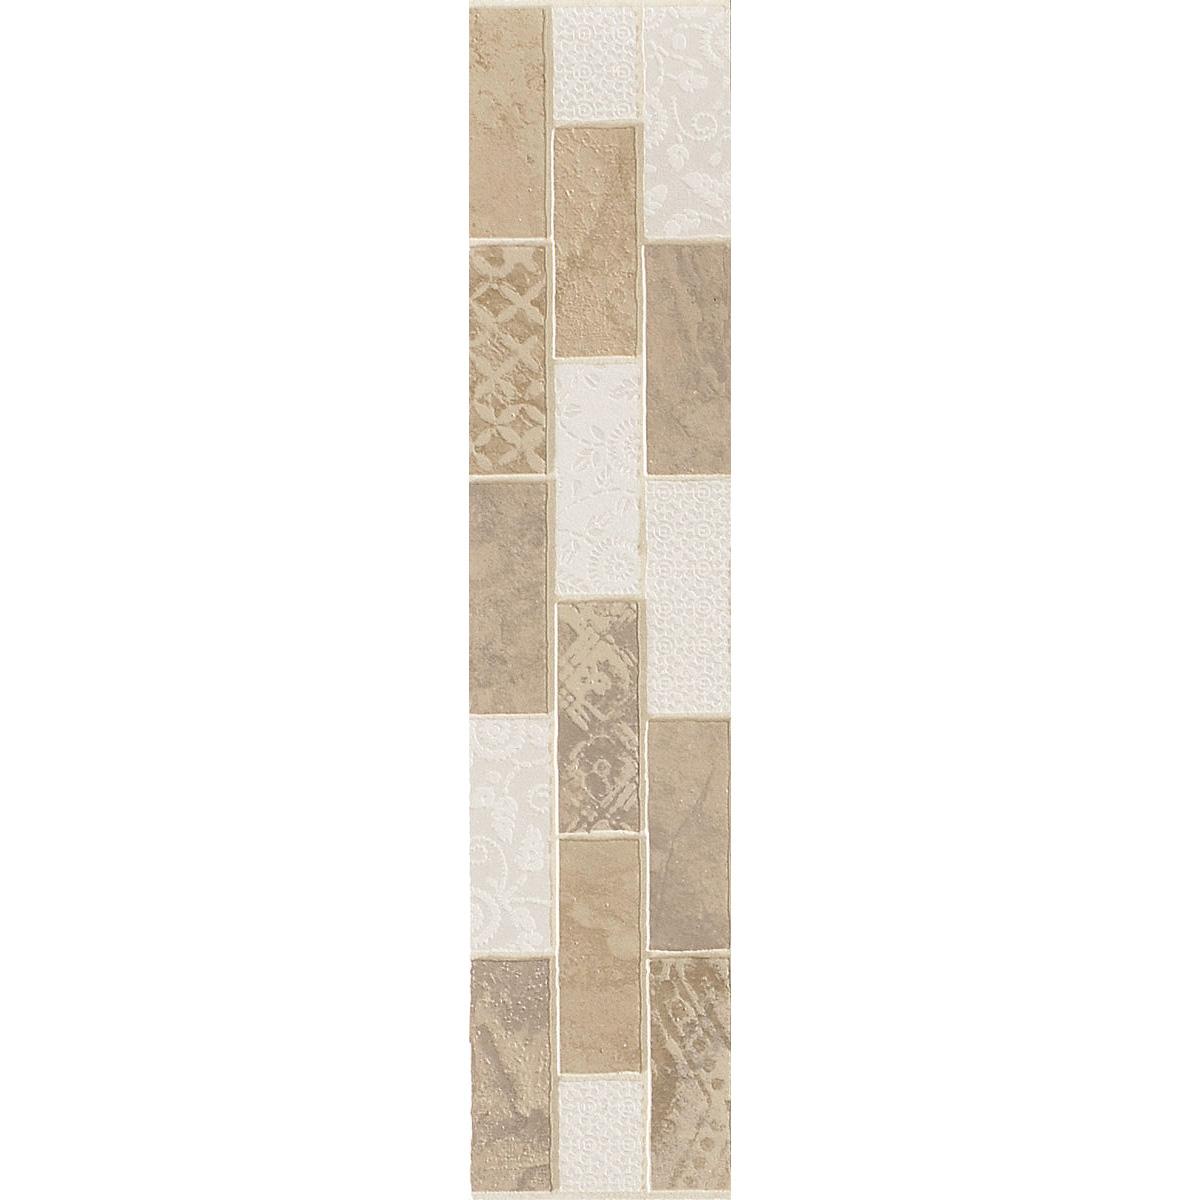 Cotto classiko brick beige (zmx28a1) изображение 1